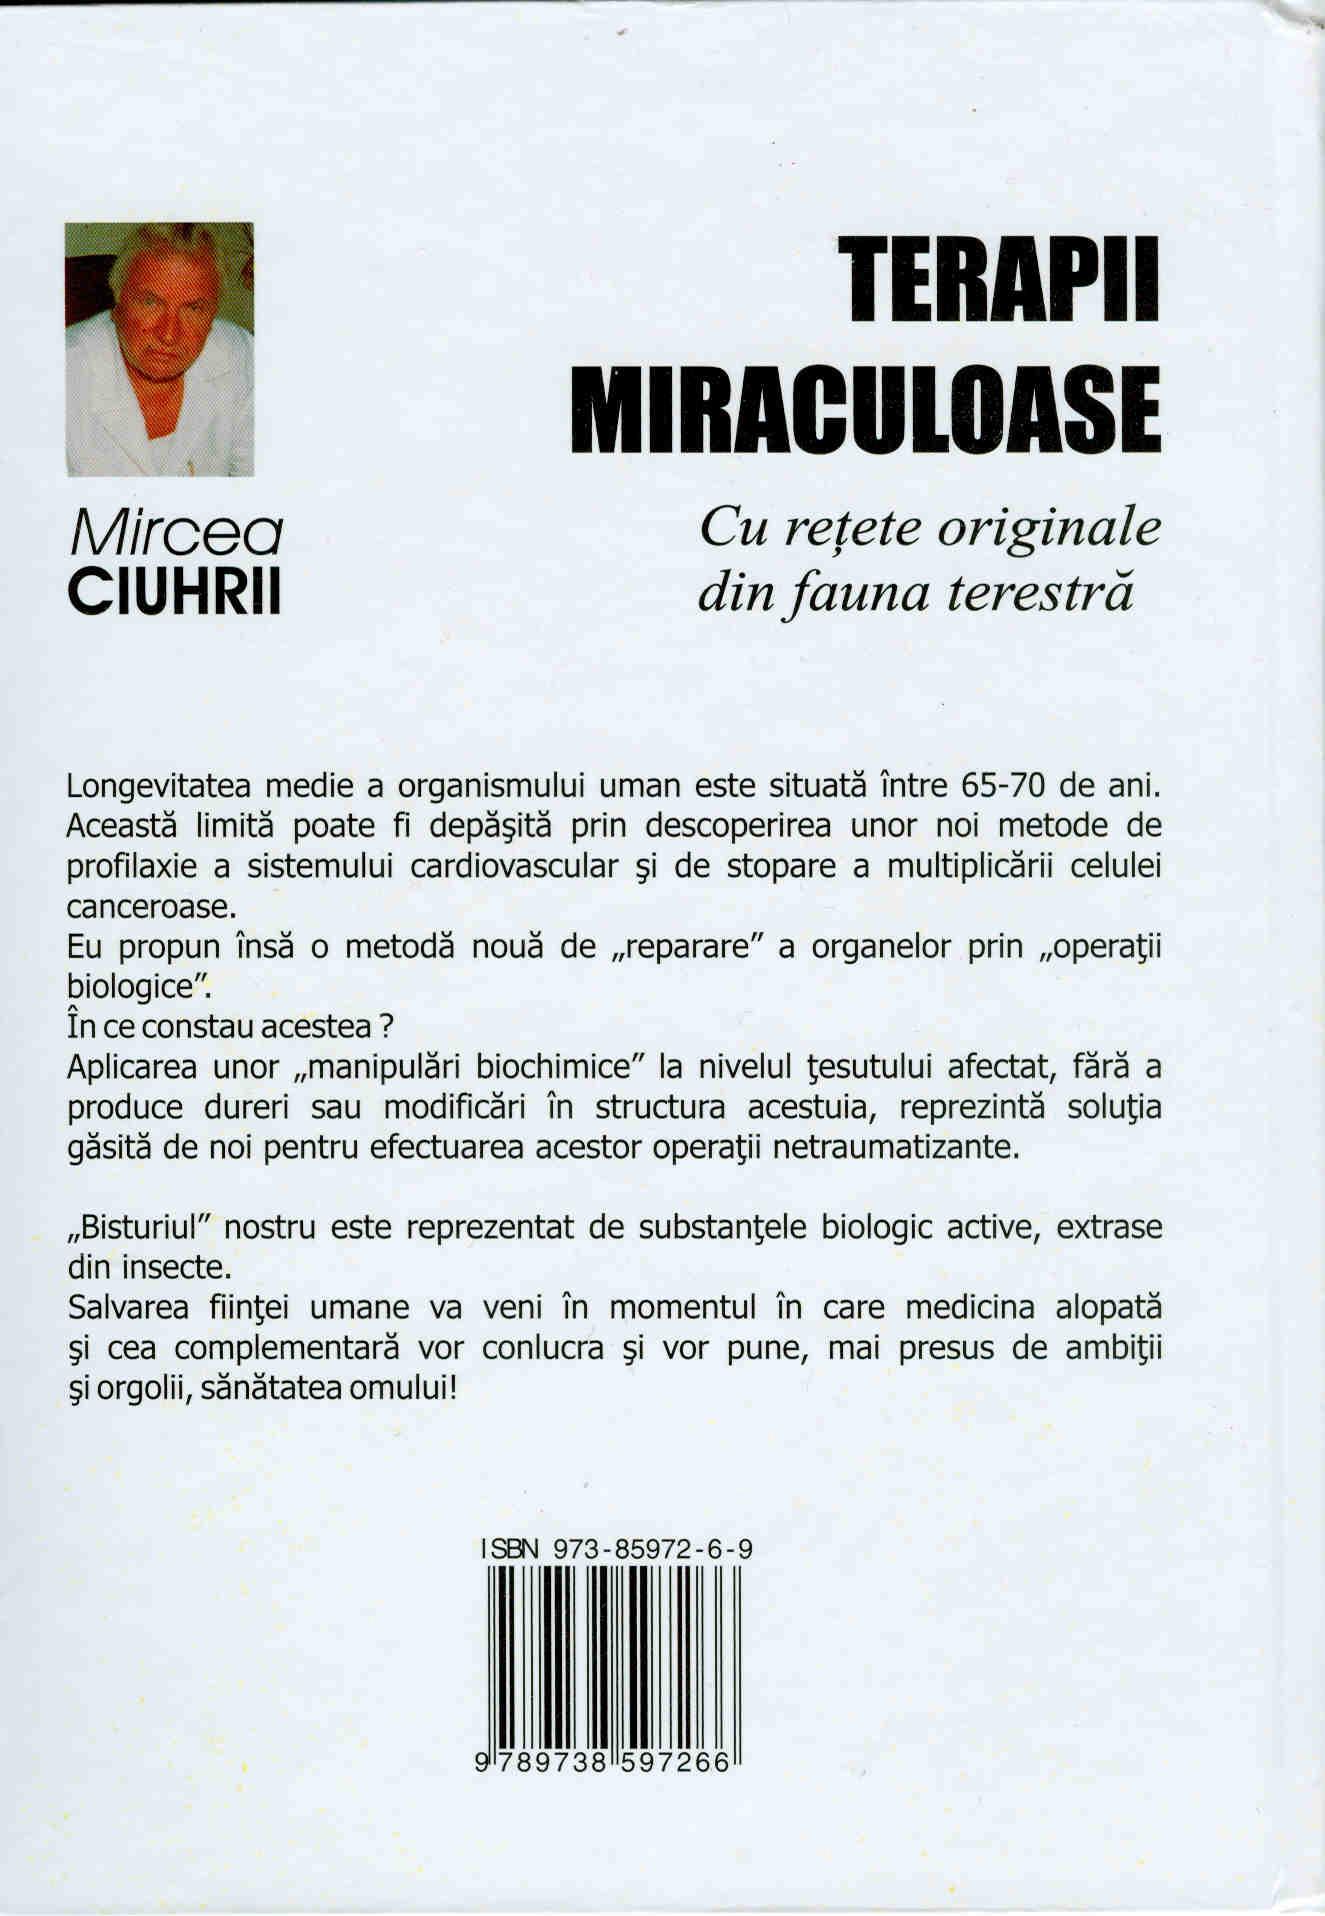 Terapii Miraculoase Verso